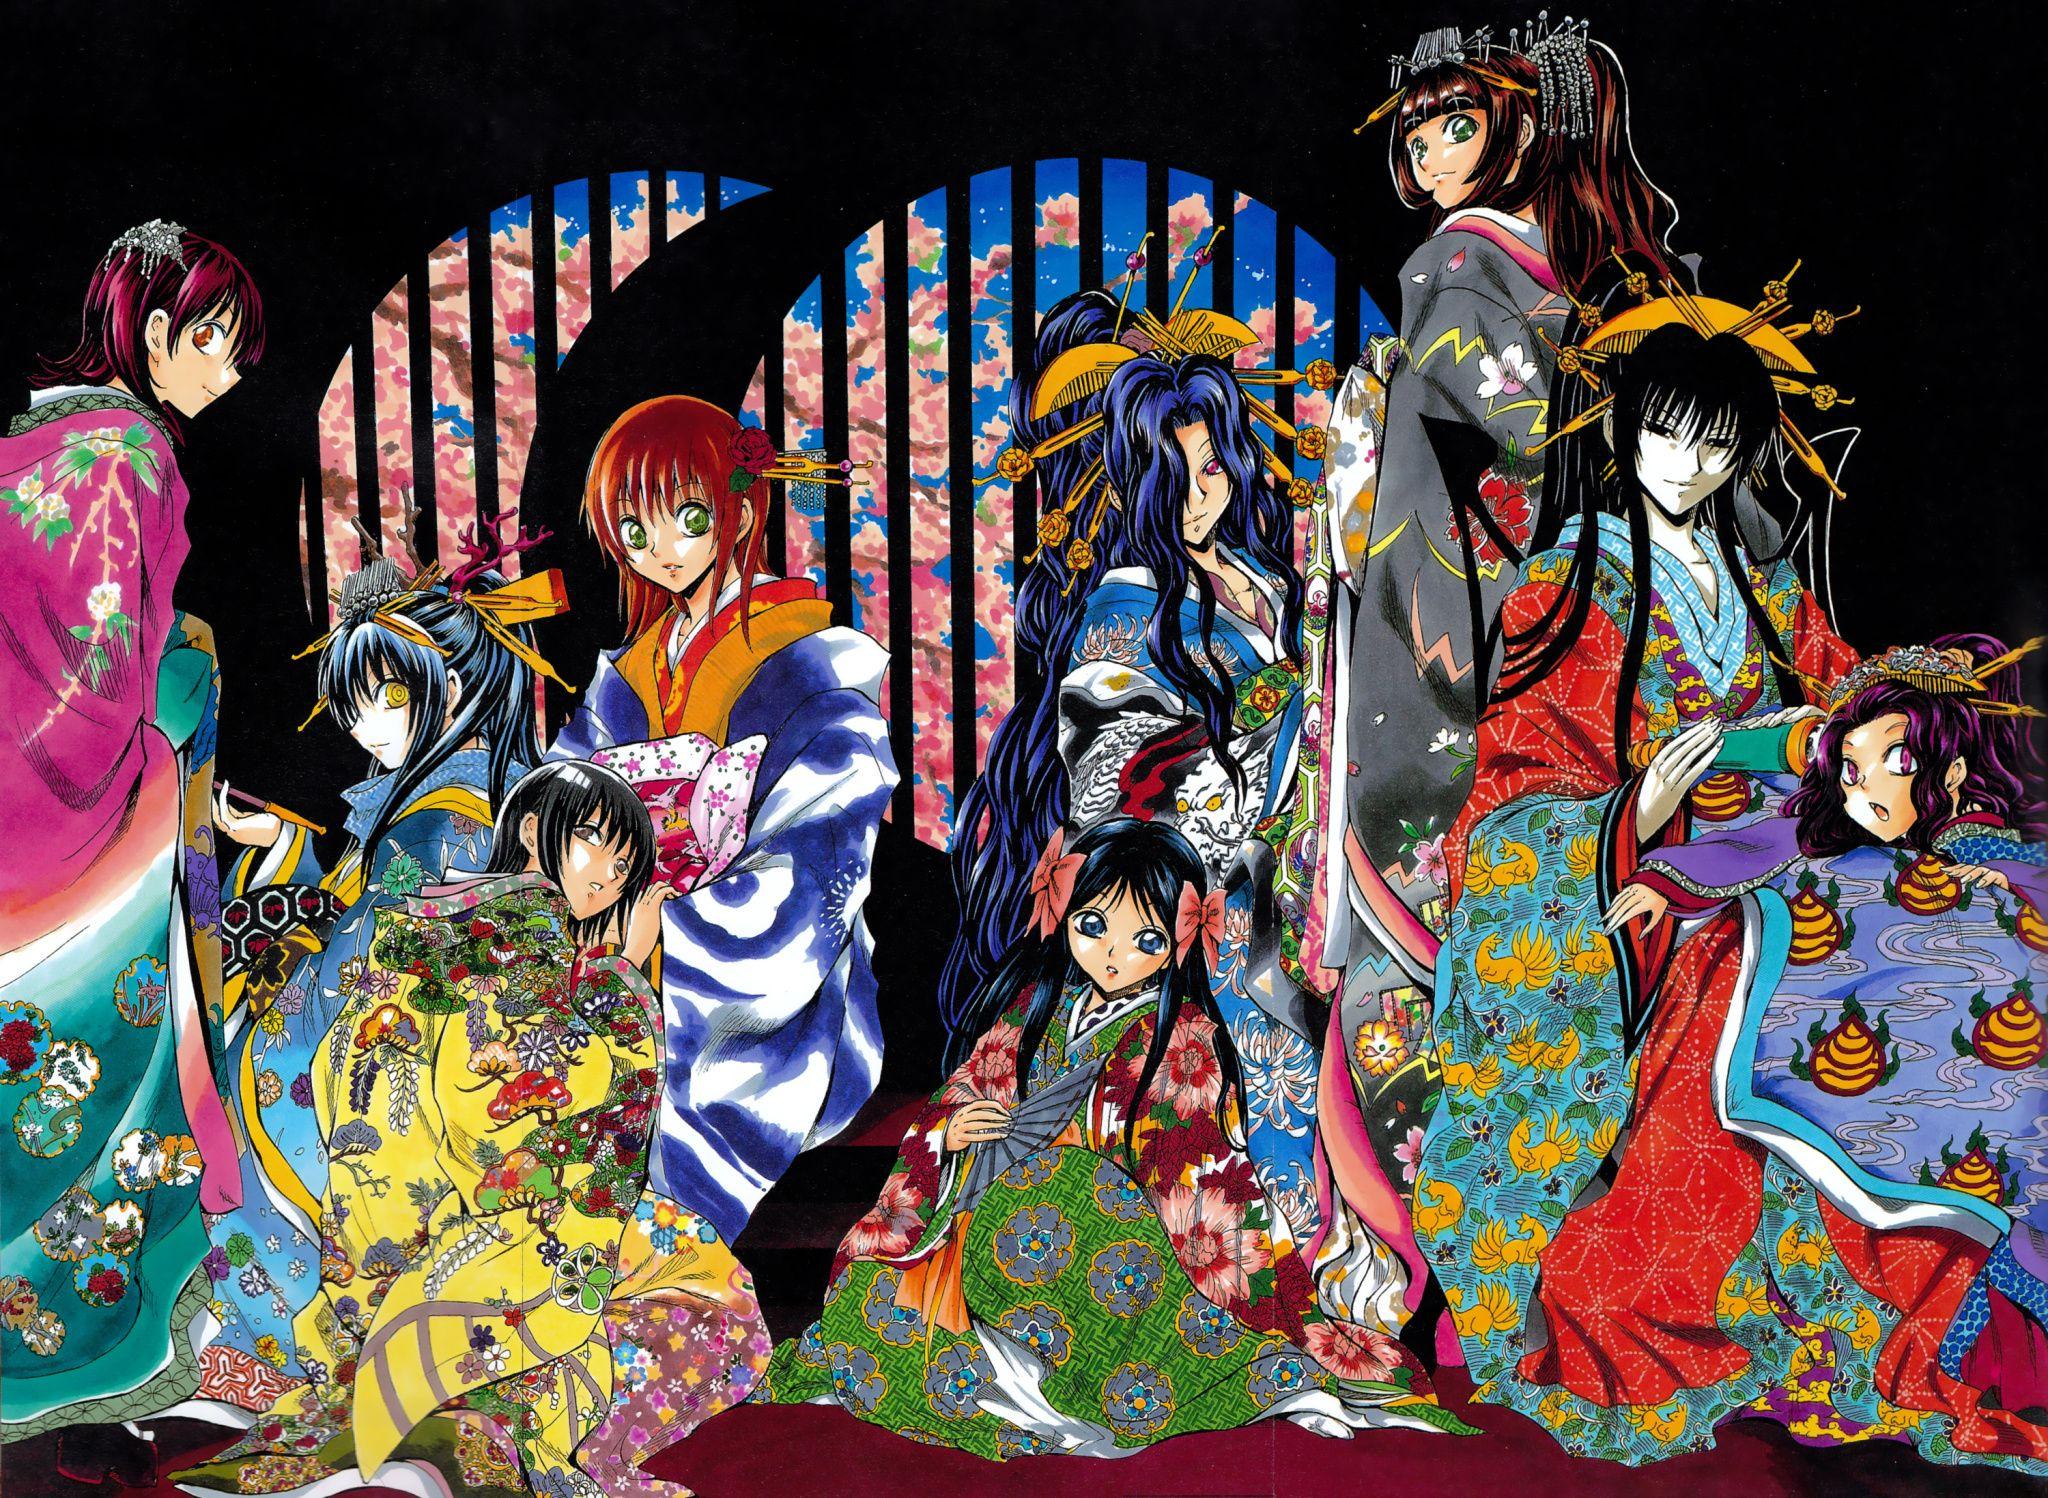 Tags: Scan, Nurarihyon No Mago, Yuki Onna (Nurarihyon